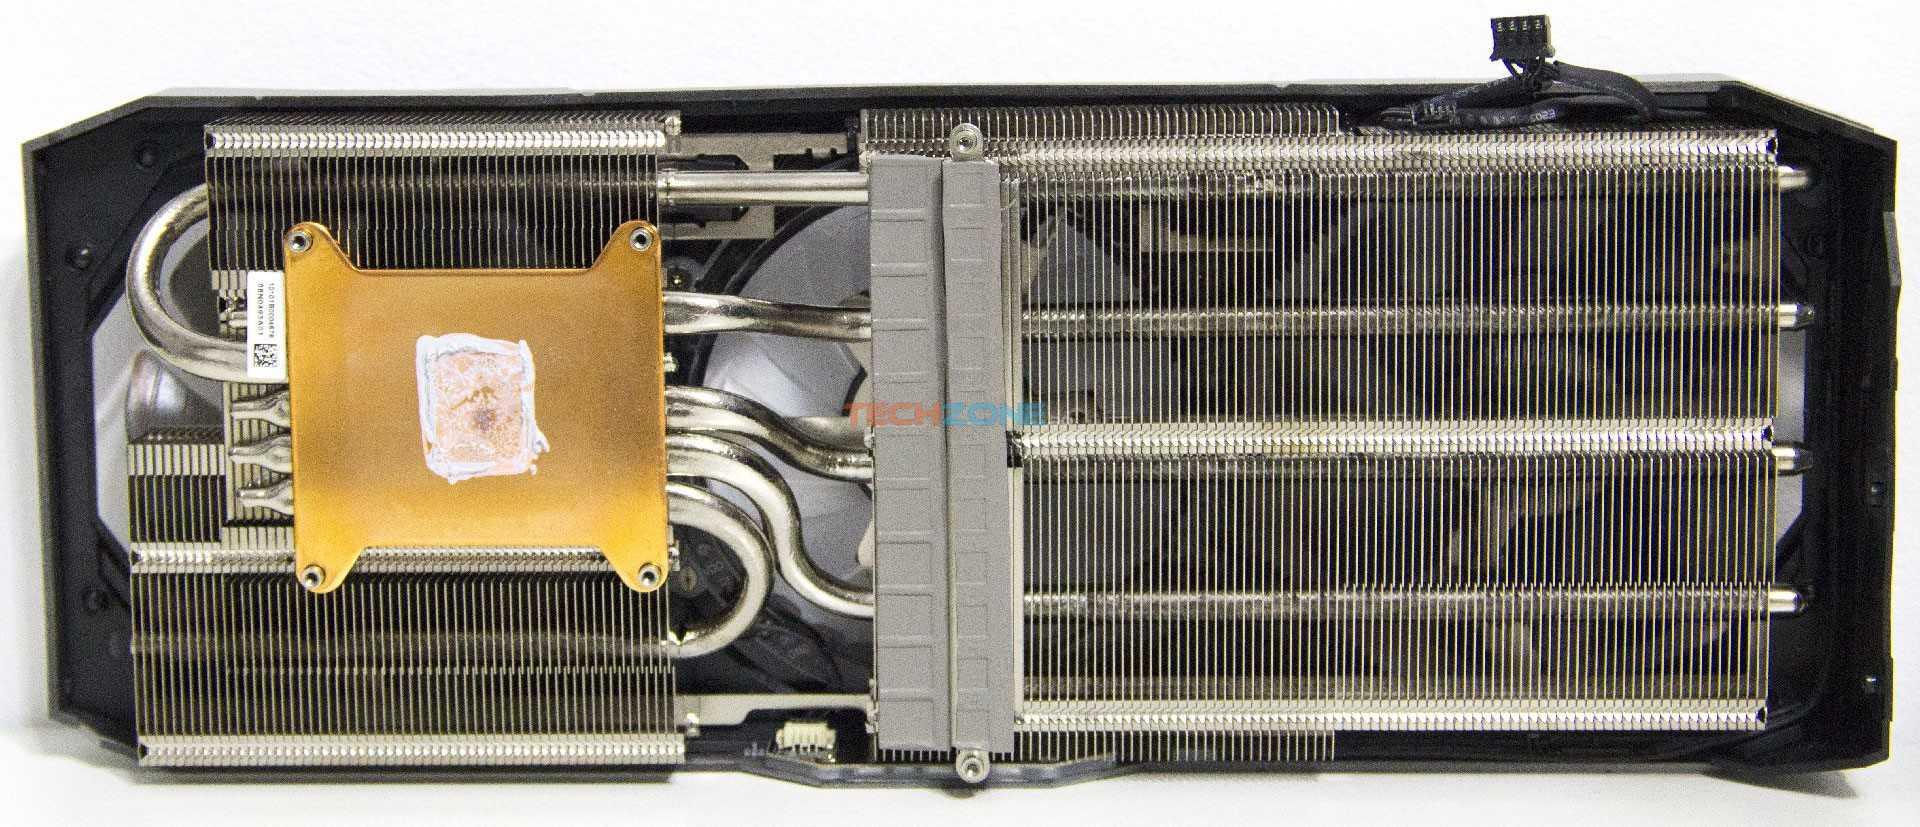 ASRock RX 5700XT Taichi cooler